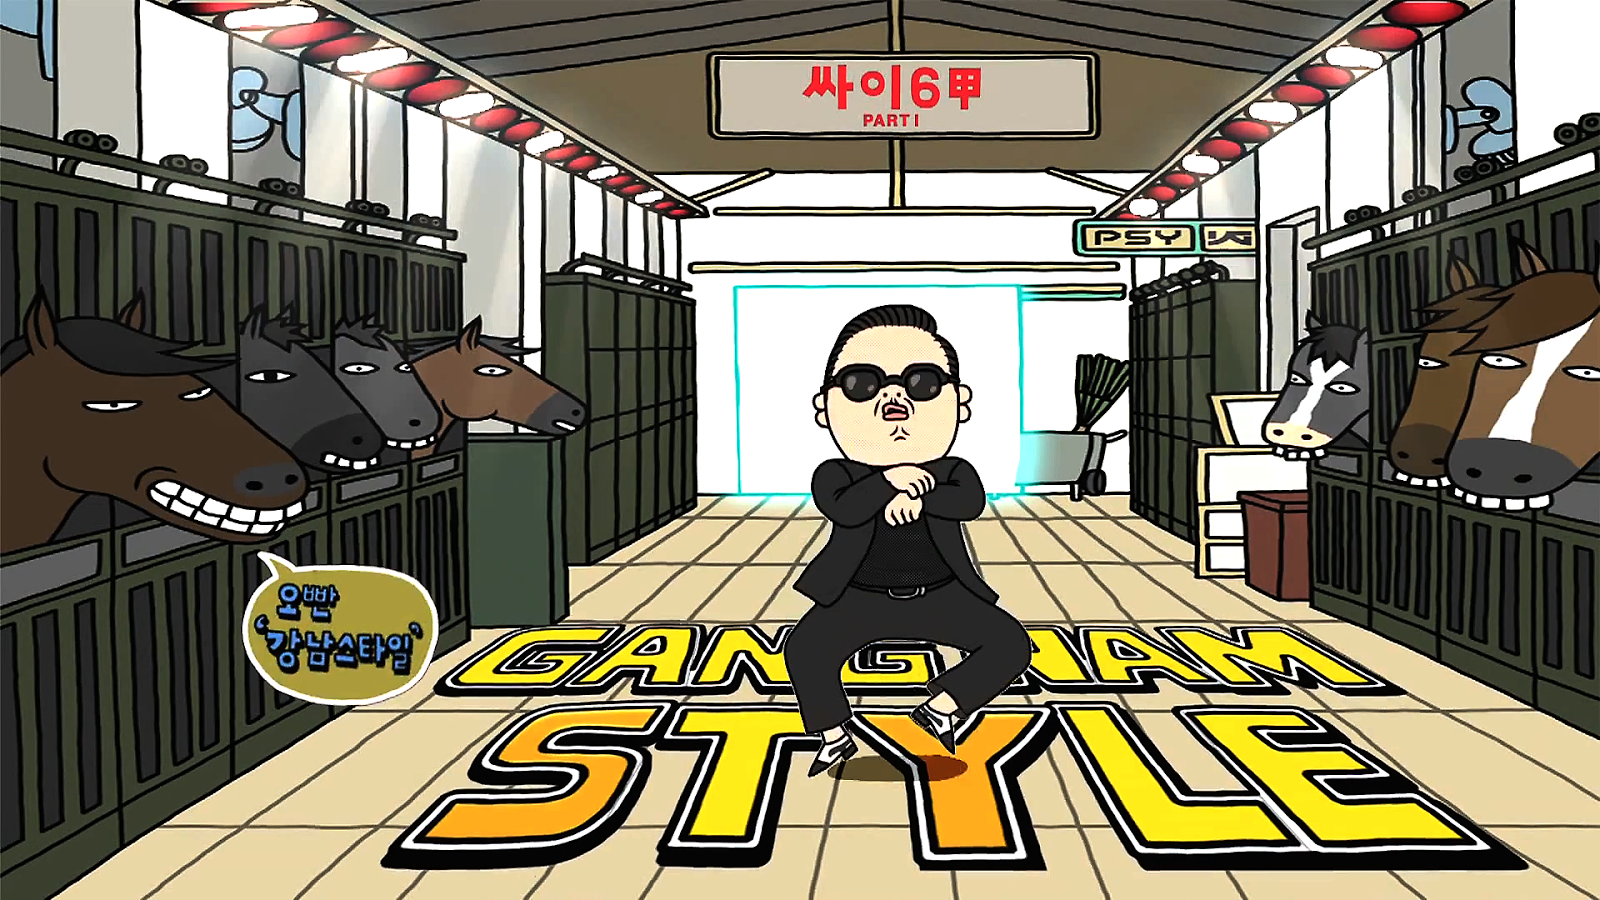 http://4.bp.blogspot.com/-uRy1ndIbFN0/UQHk0H5uLiI/AAAAAAAA5lw/d-HgK8NaM5s/s1600/oppa-gangnam-style-wallpaper-hd.png